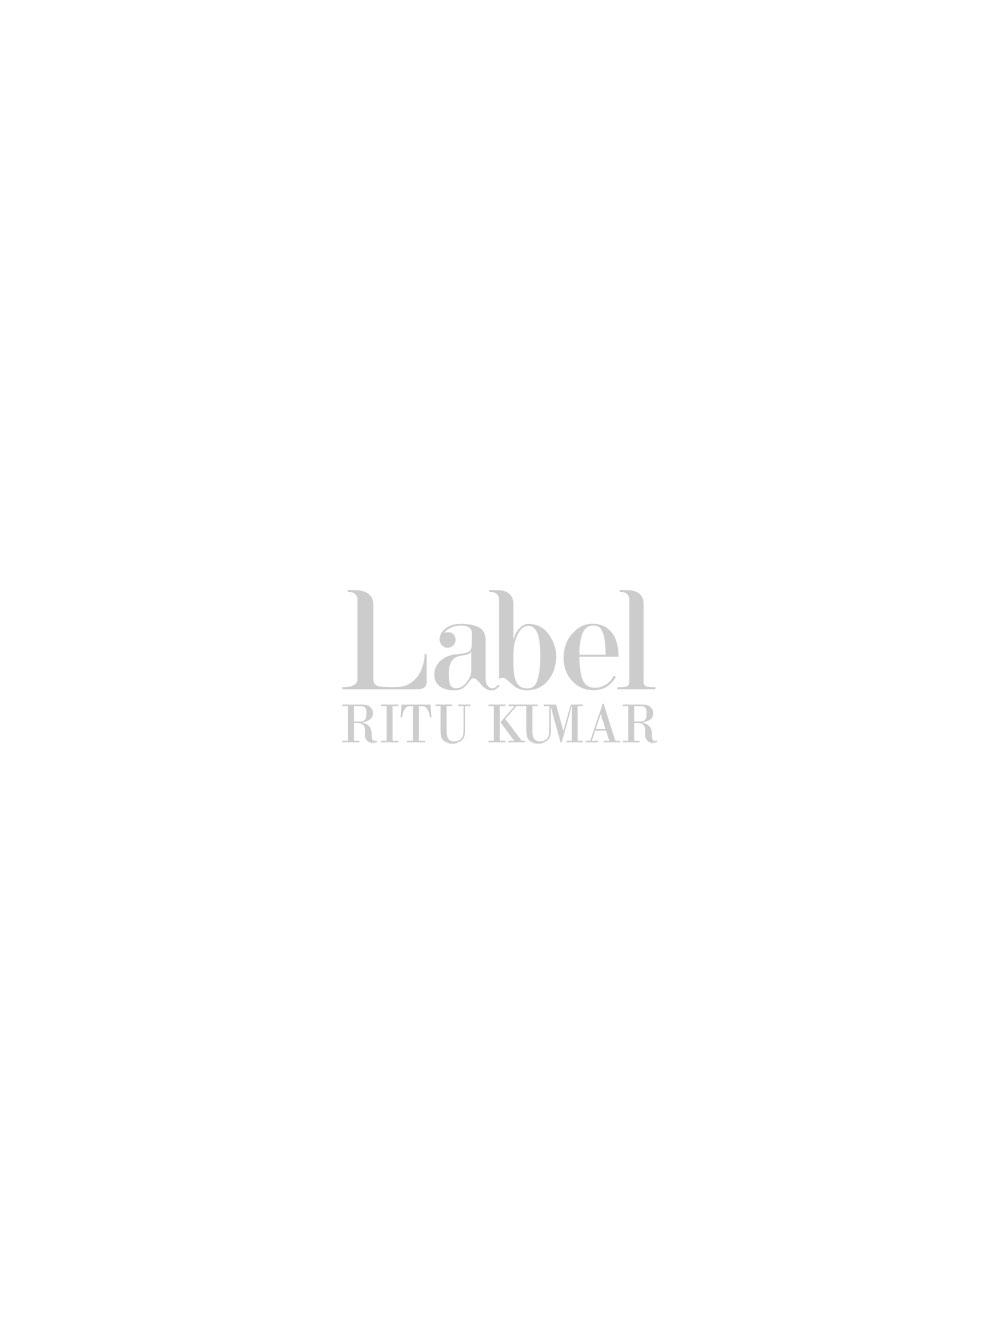 fb98f765c8d17 Label Ritu Kumar | Shirt Dress, Floral Print Shirt Dress, Long ...